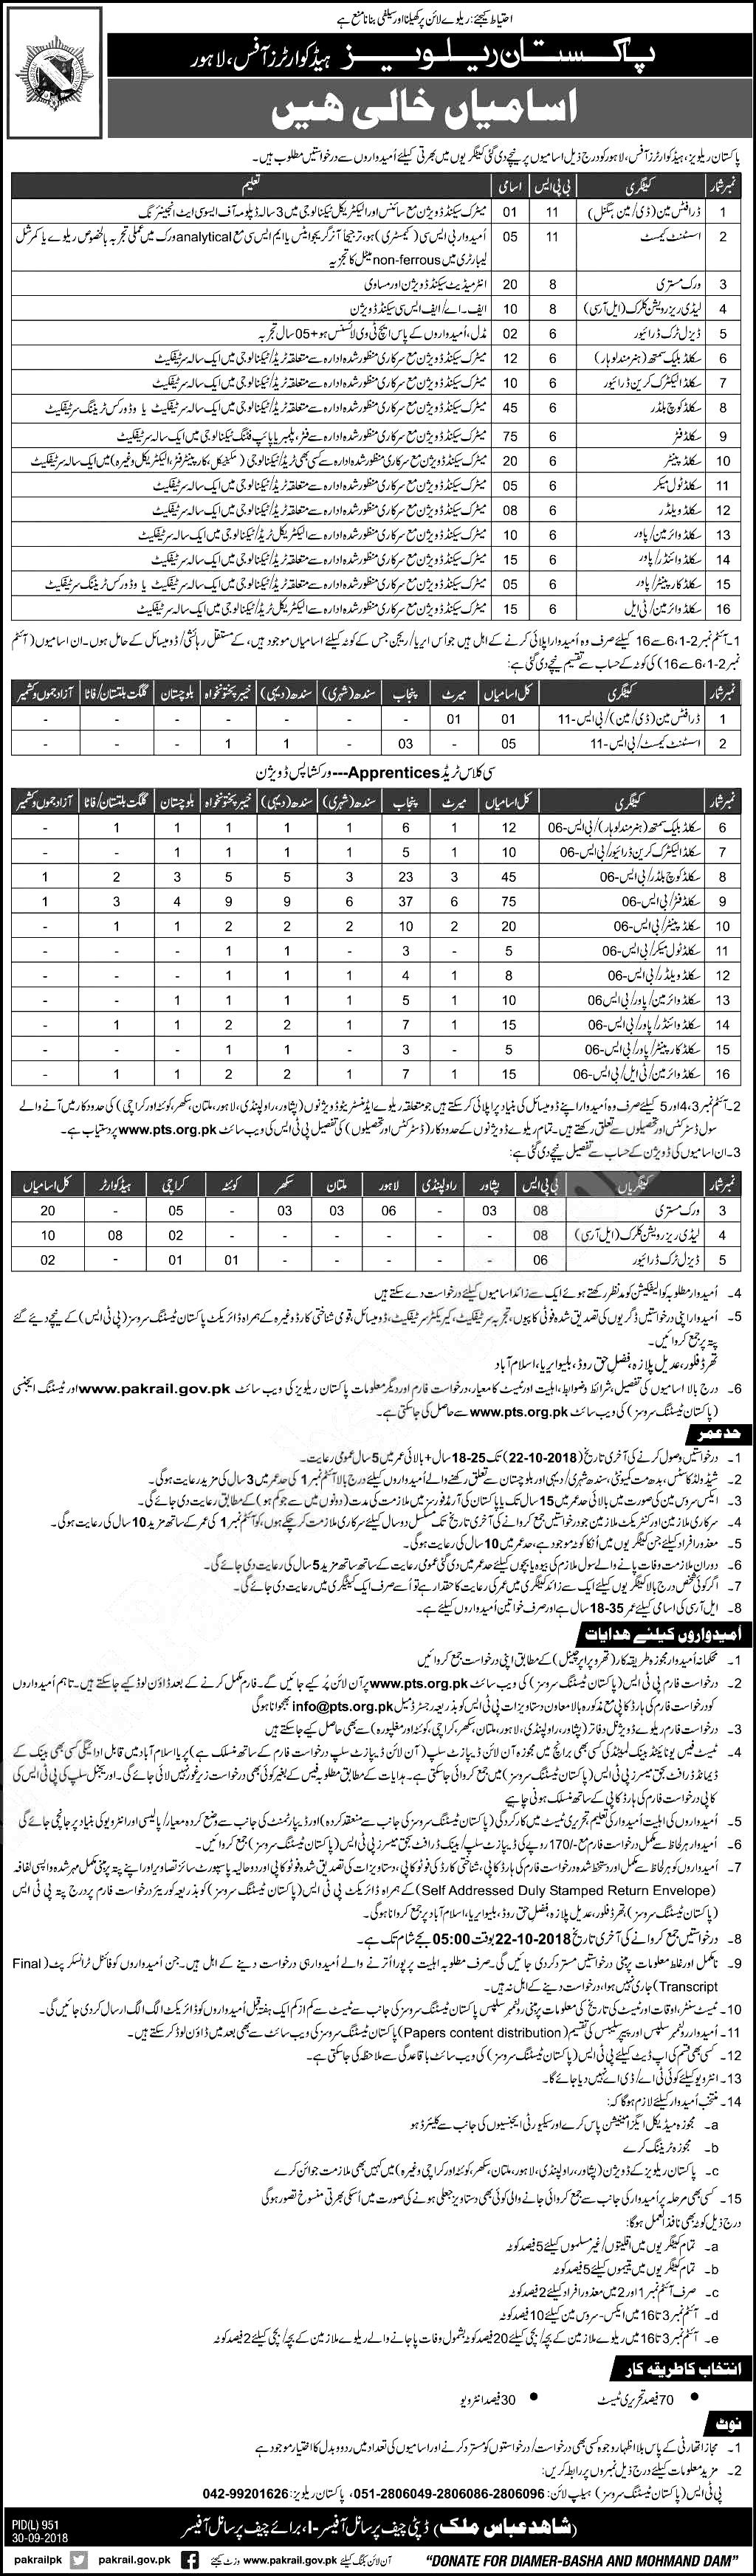 PTS Pak Railways Jobs 2018 Application Form & Roll No Slip Download